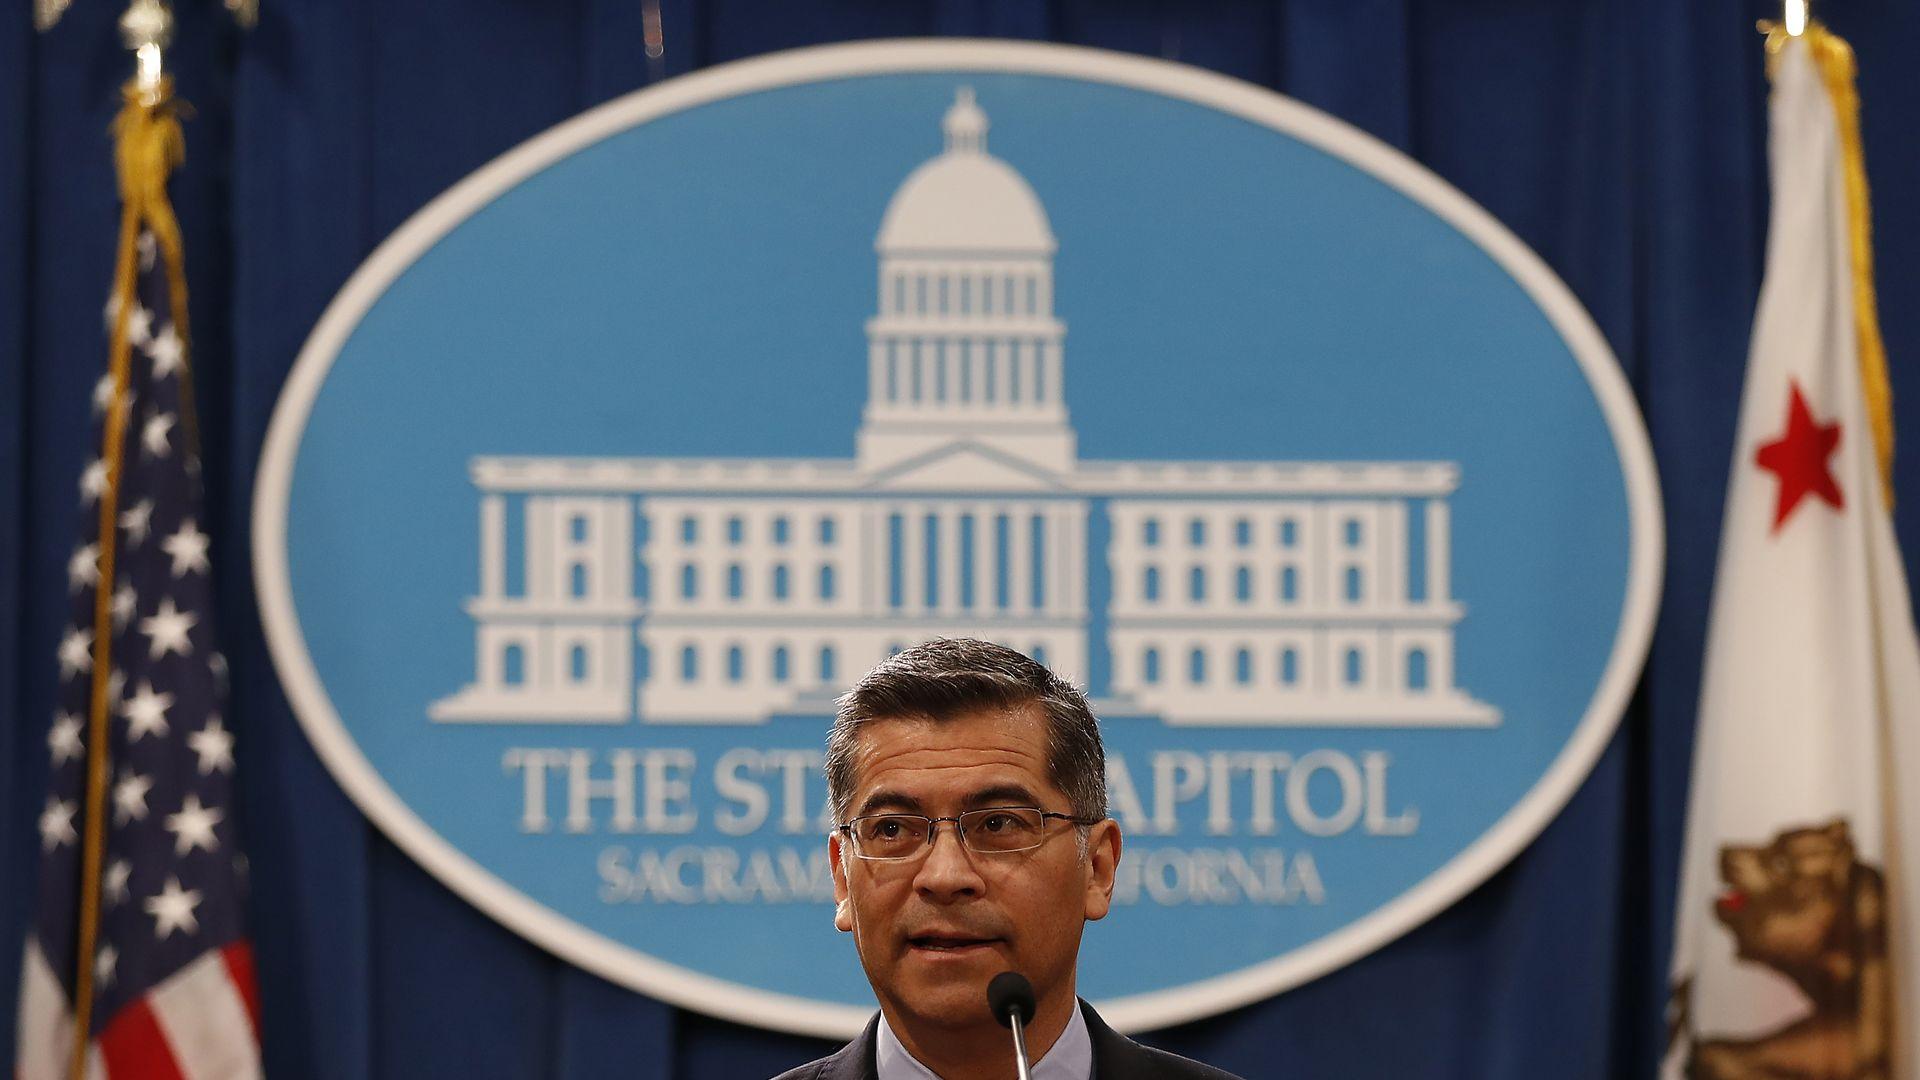 California State's Attorney Xavier Becerra